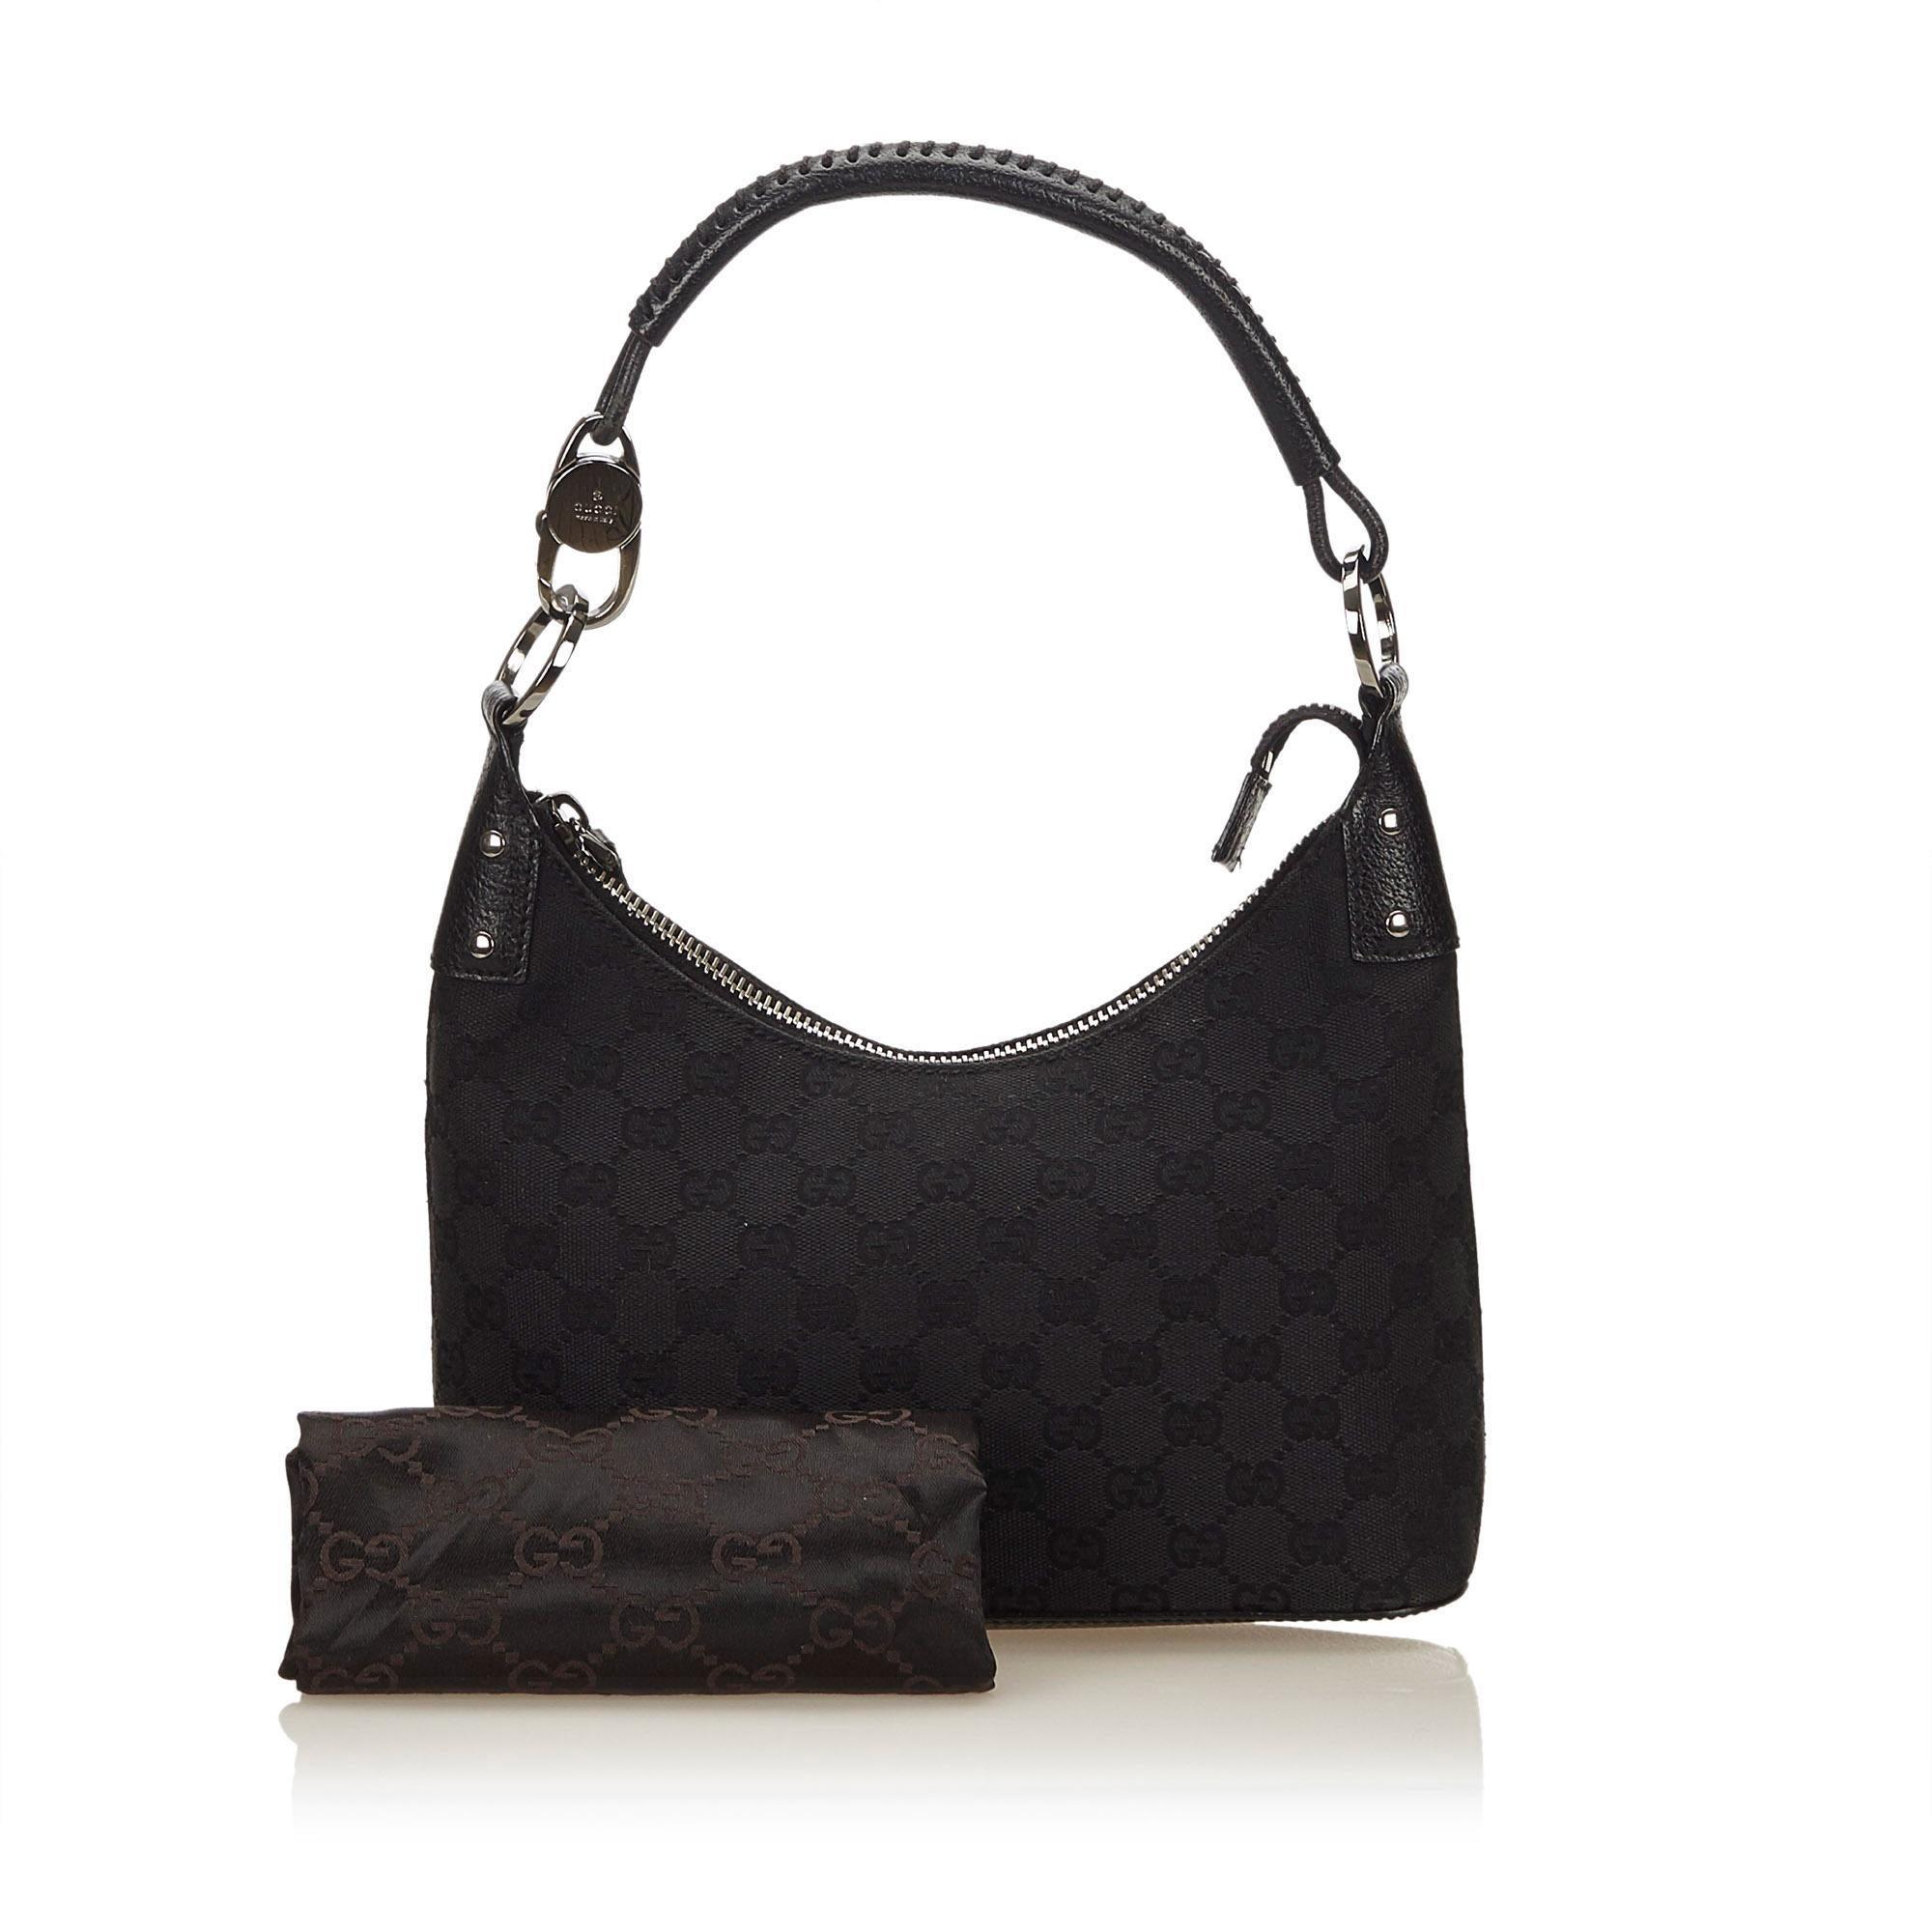 f3ff20258db9ce Gucci Black Guccissima Jacquard Hobo bag For Sale at 1stdibs